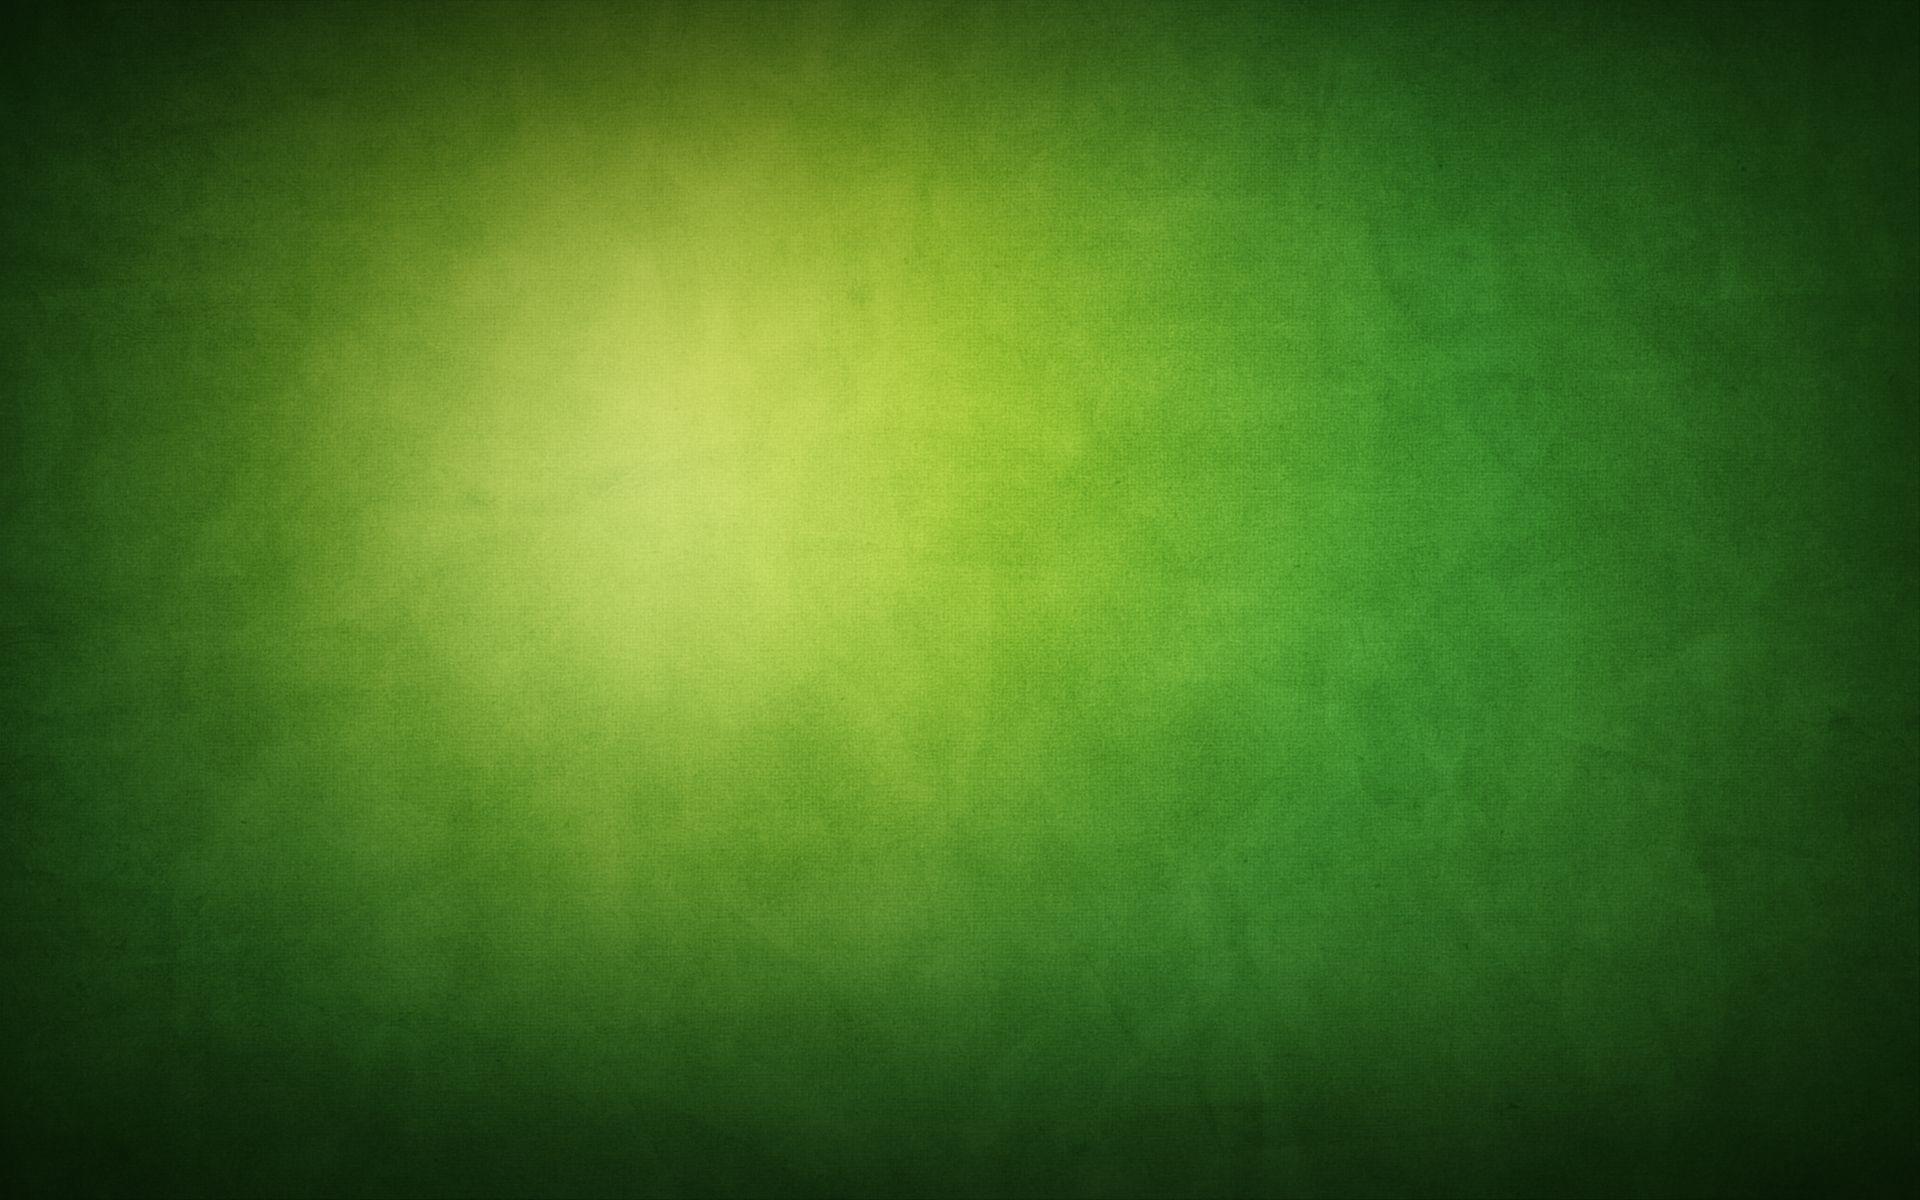 stock photos free images bing images a· green wallpaperwallpaper